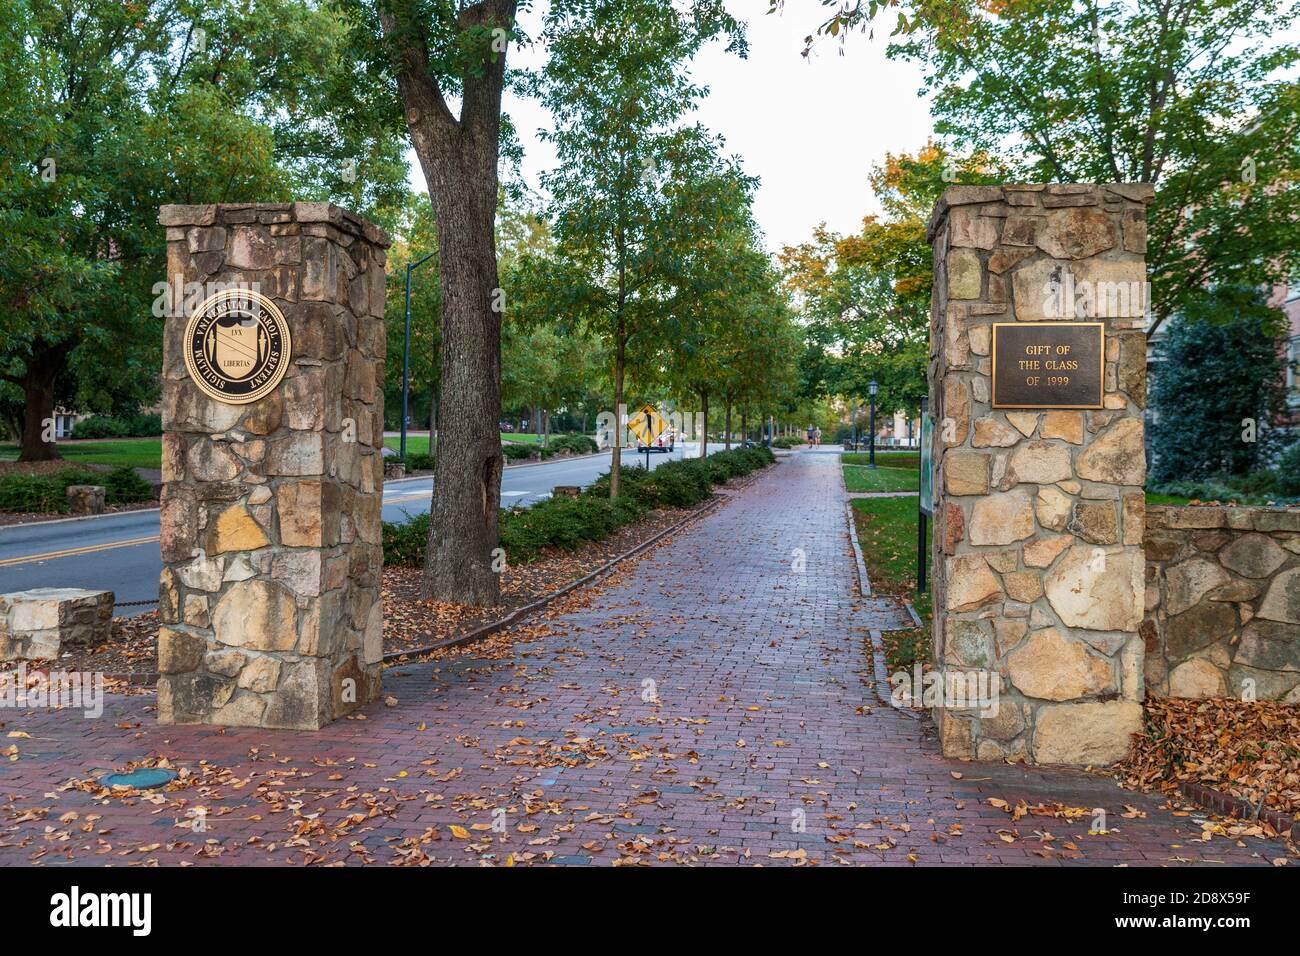 Chapel Hill, NC / USA - October 23, 2020: Stone entrance to the University of North Carolina Chapel hill with brick sidewalk Stock Photo